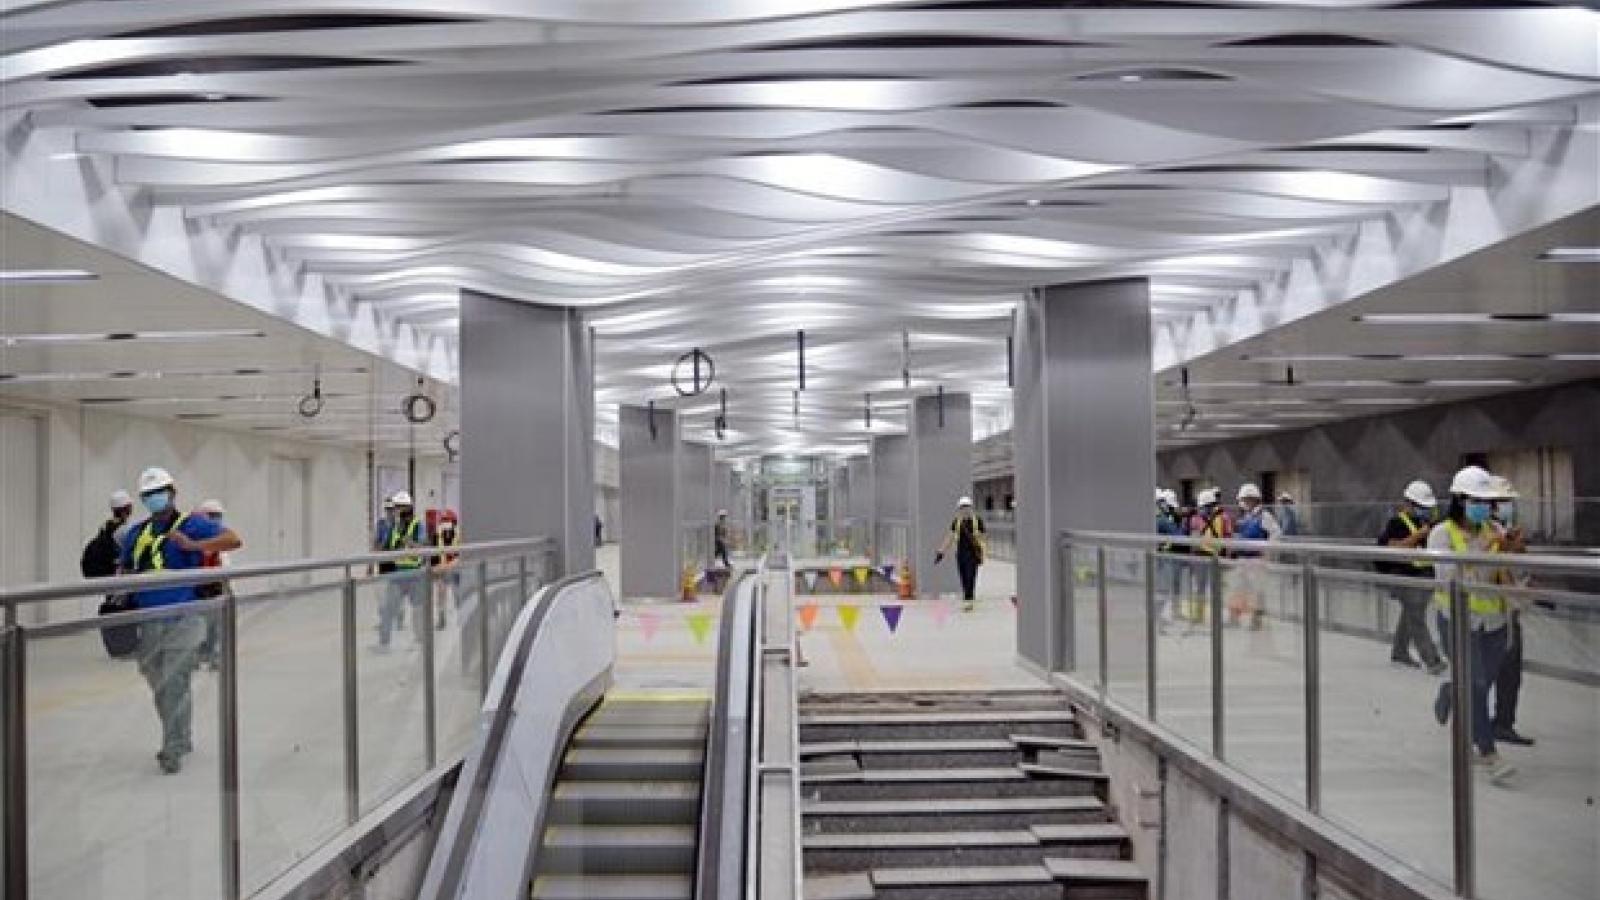 Ba Son underground station's ground floor completed ahead of schedule